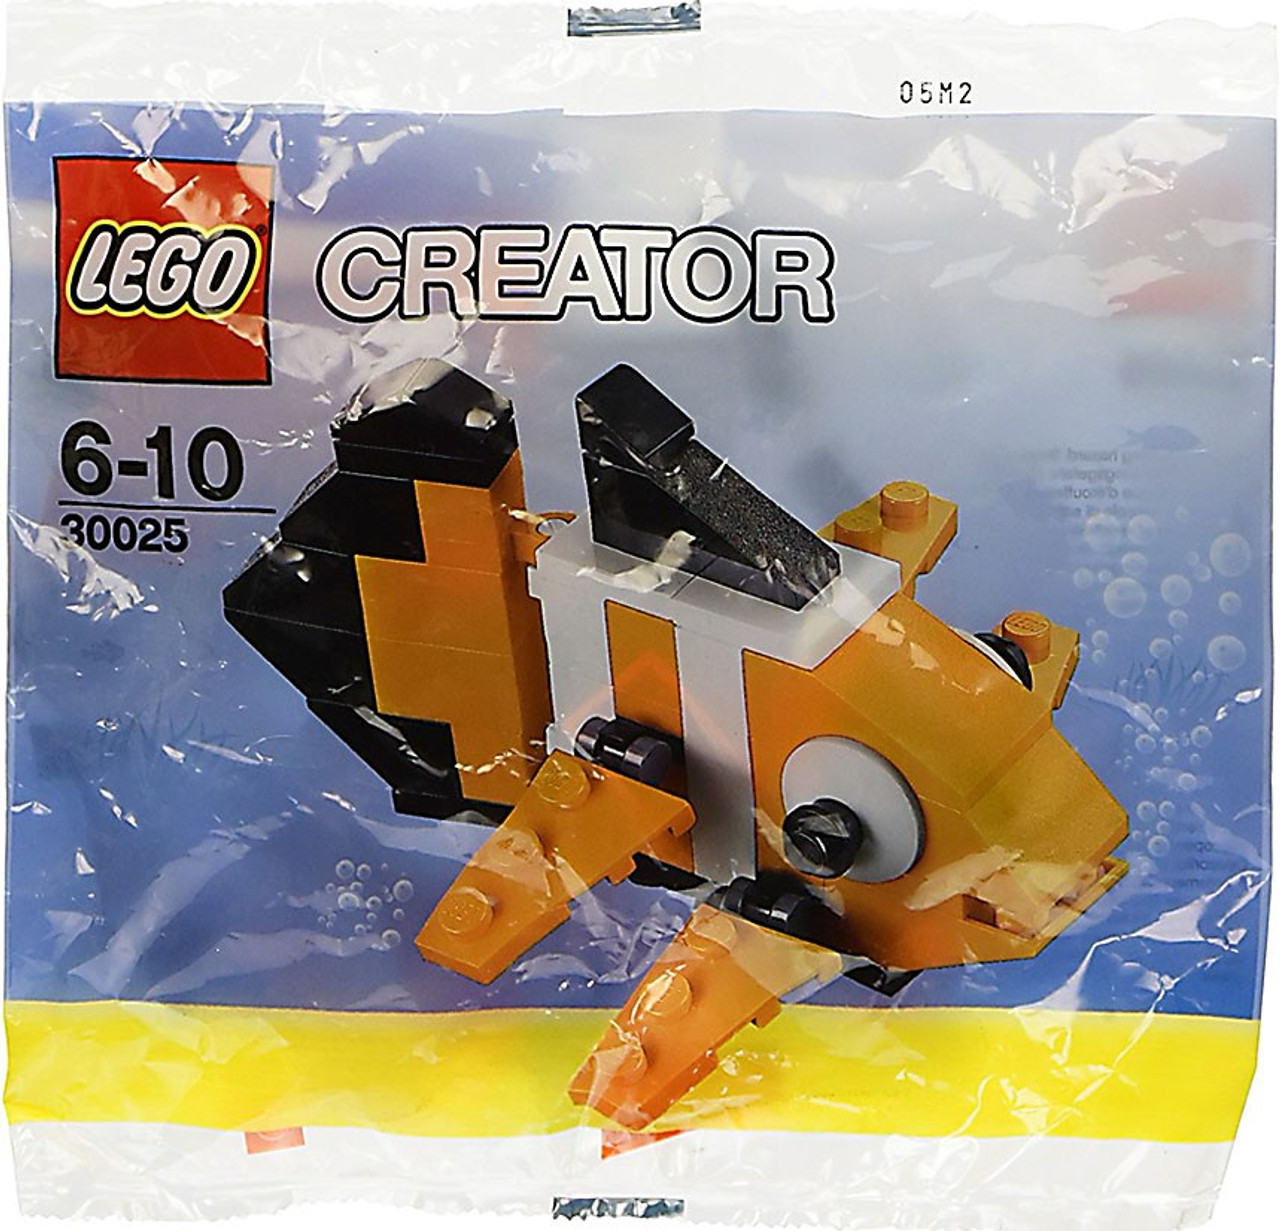 LEGO Creator Clown Fish Mini Set #30025 [Bagged]